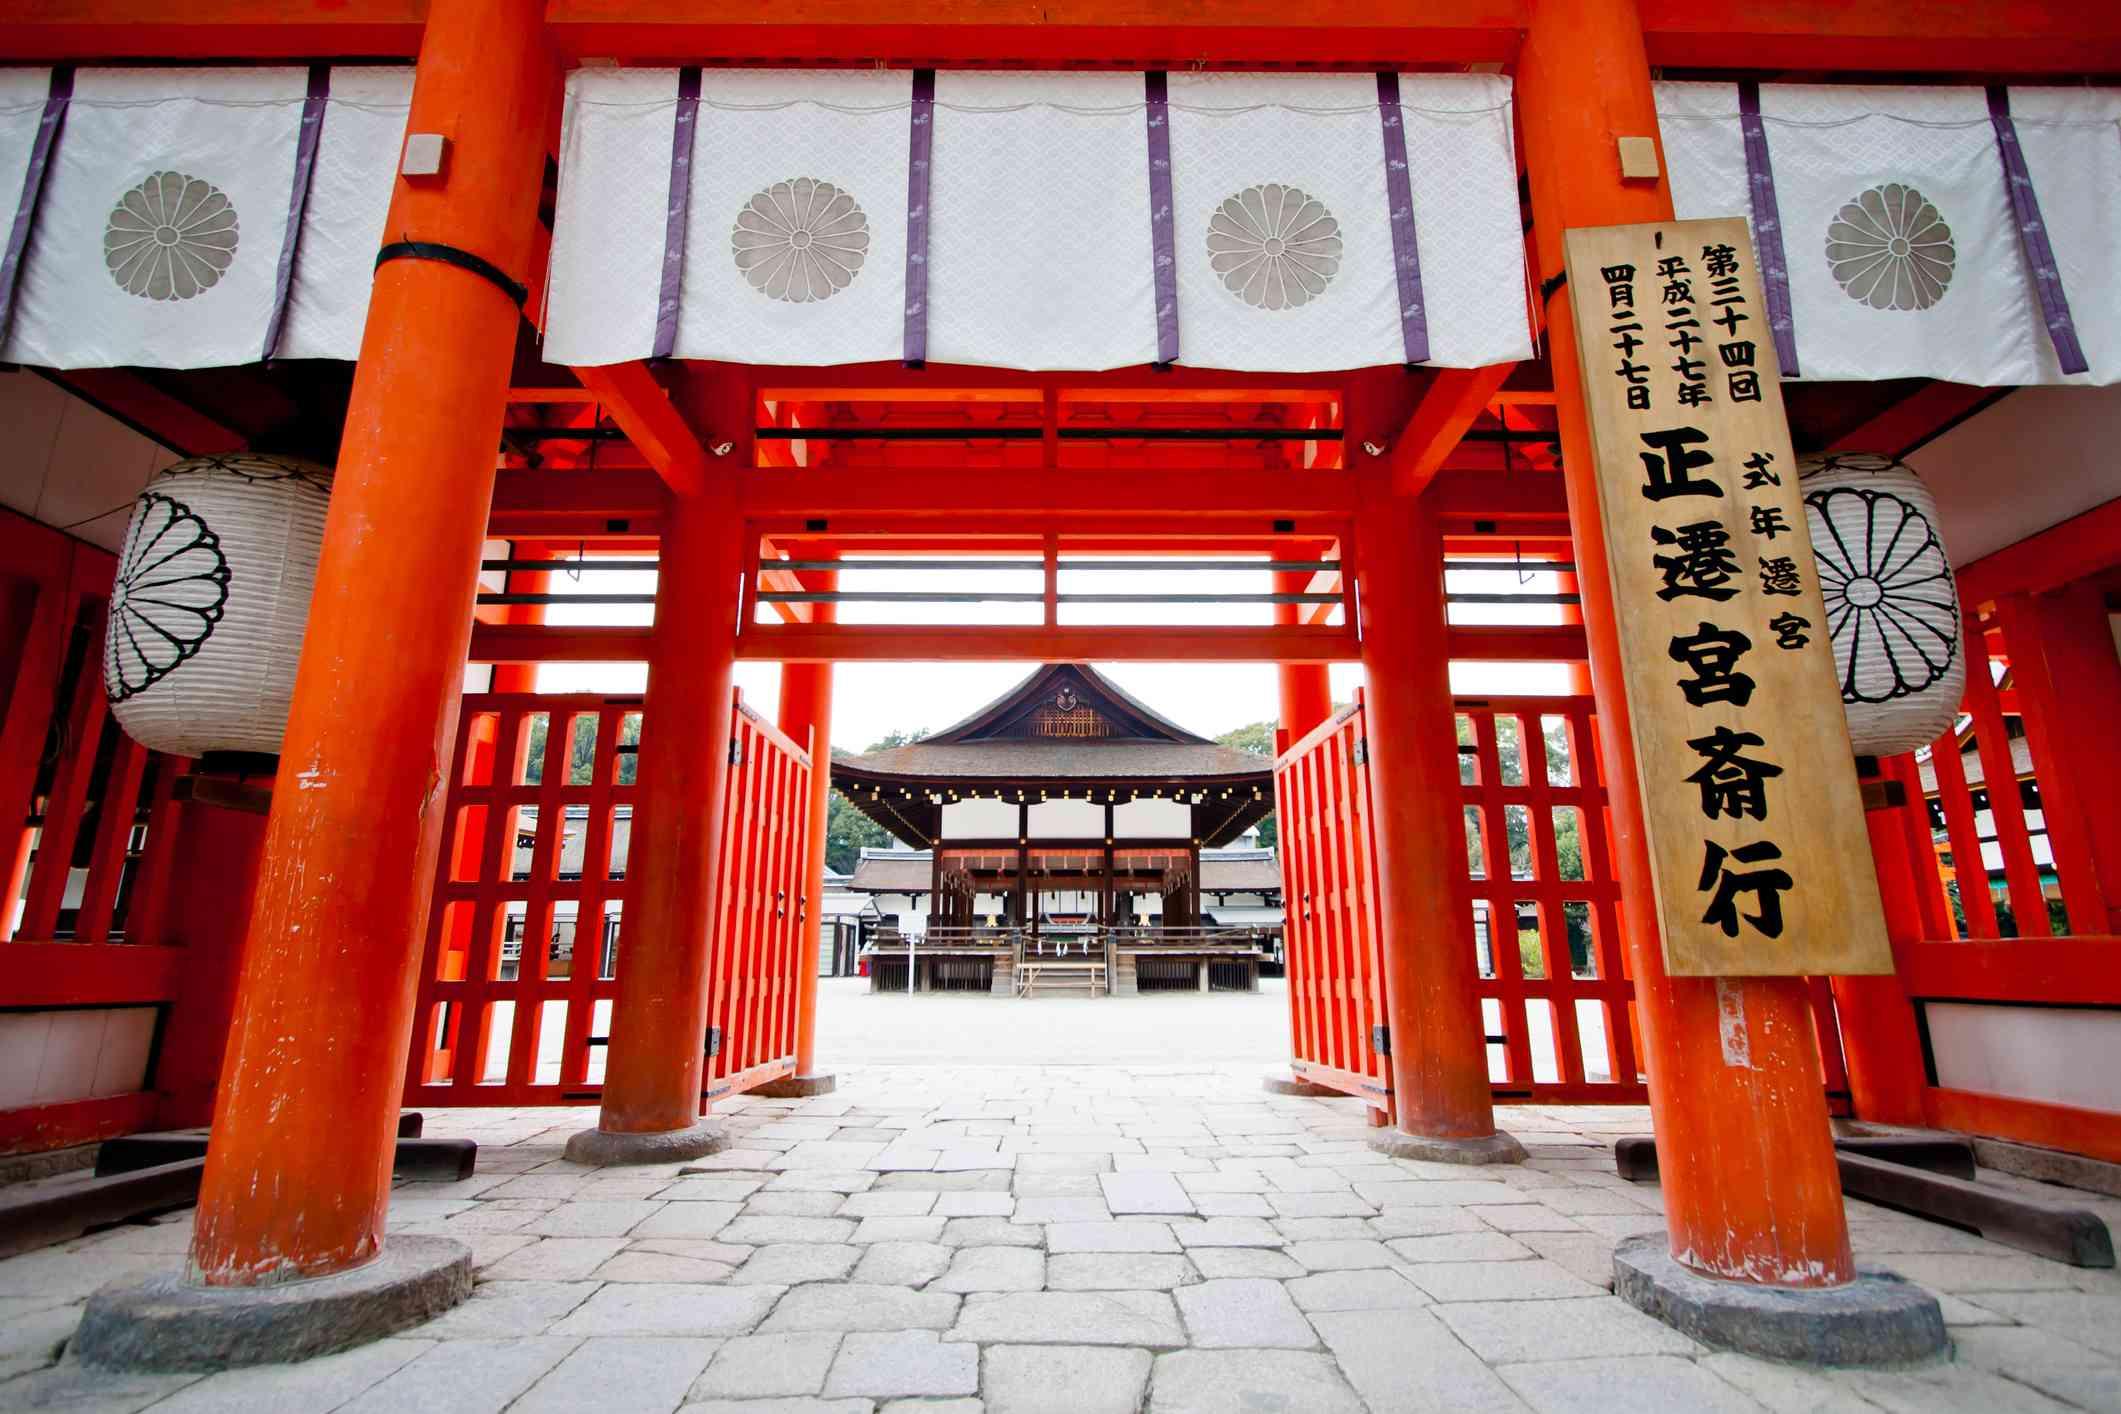 Open red doors into the Shimogamo Shrine kyoto